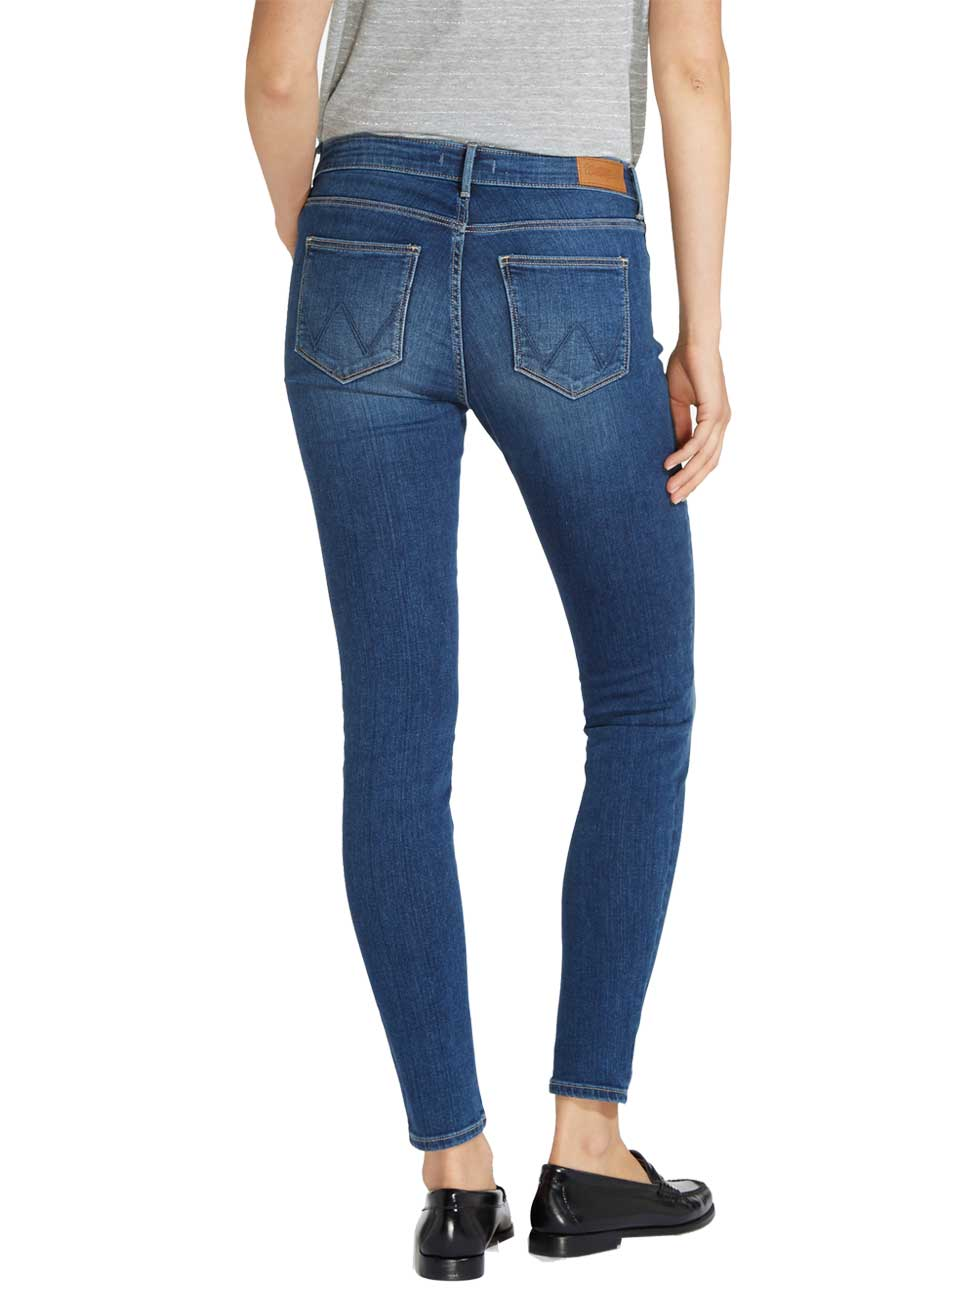 wrangler-damen-jeans-skinny-skinny-fit-blau-authentic-blue